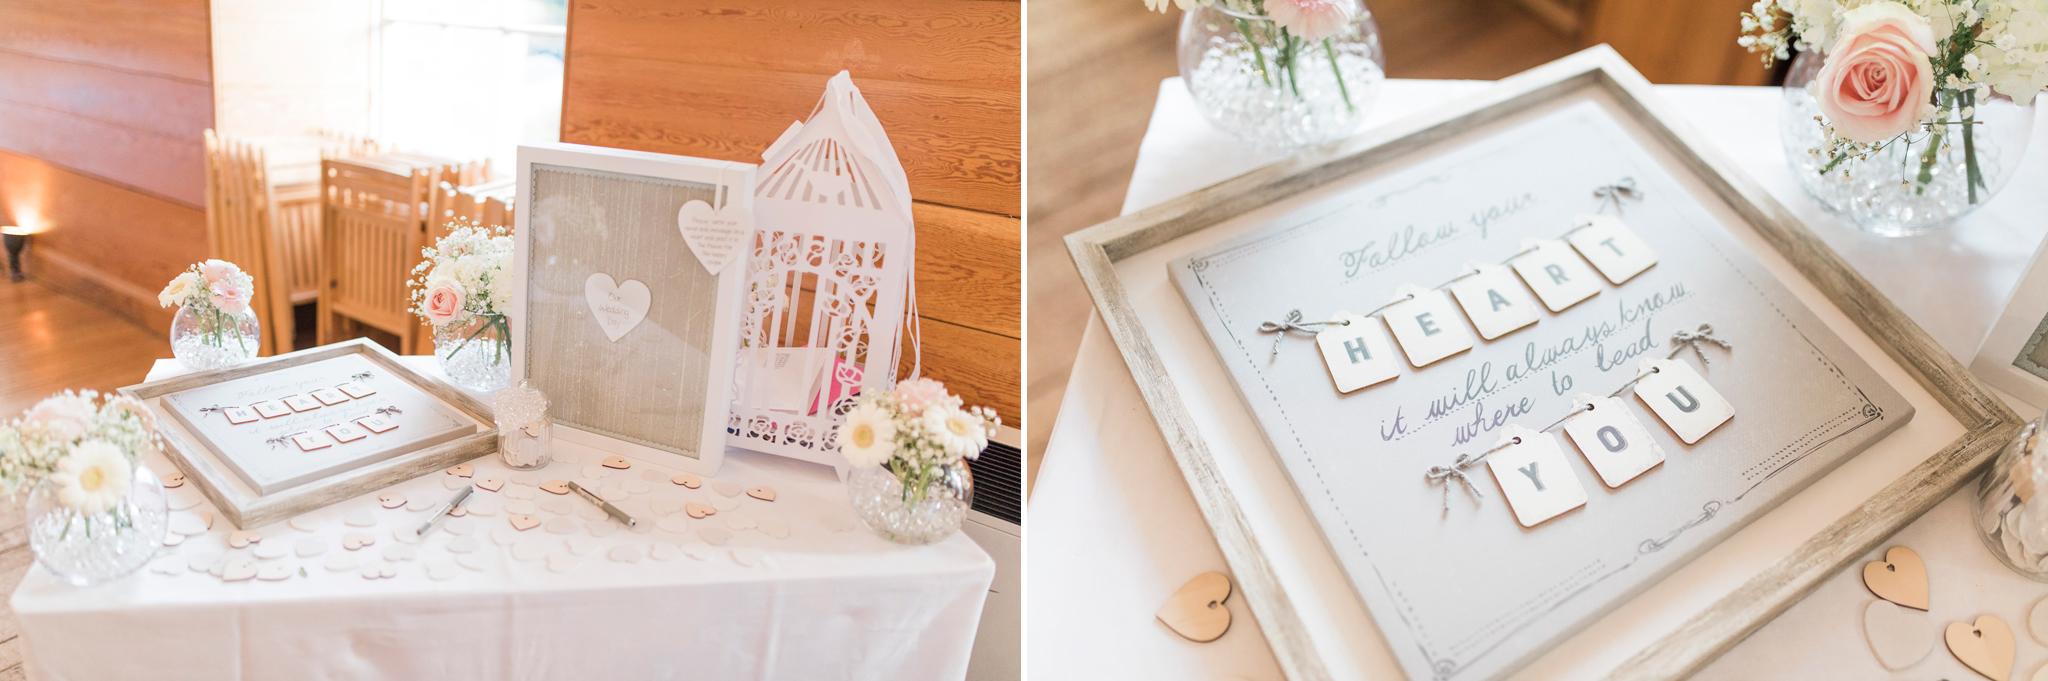 102-destination-wedding-photographer.jpg